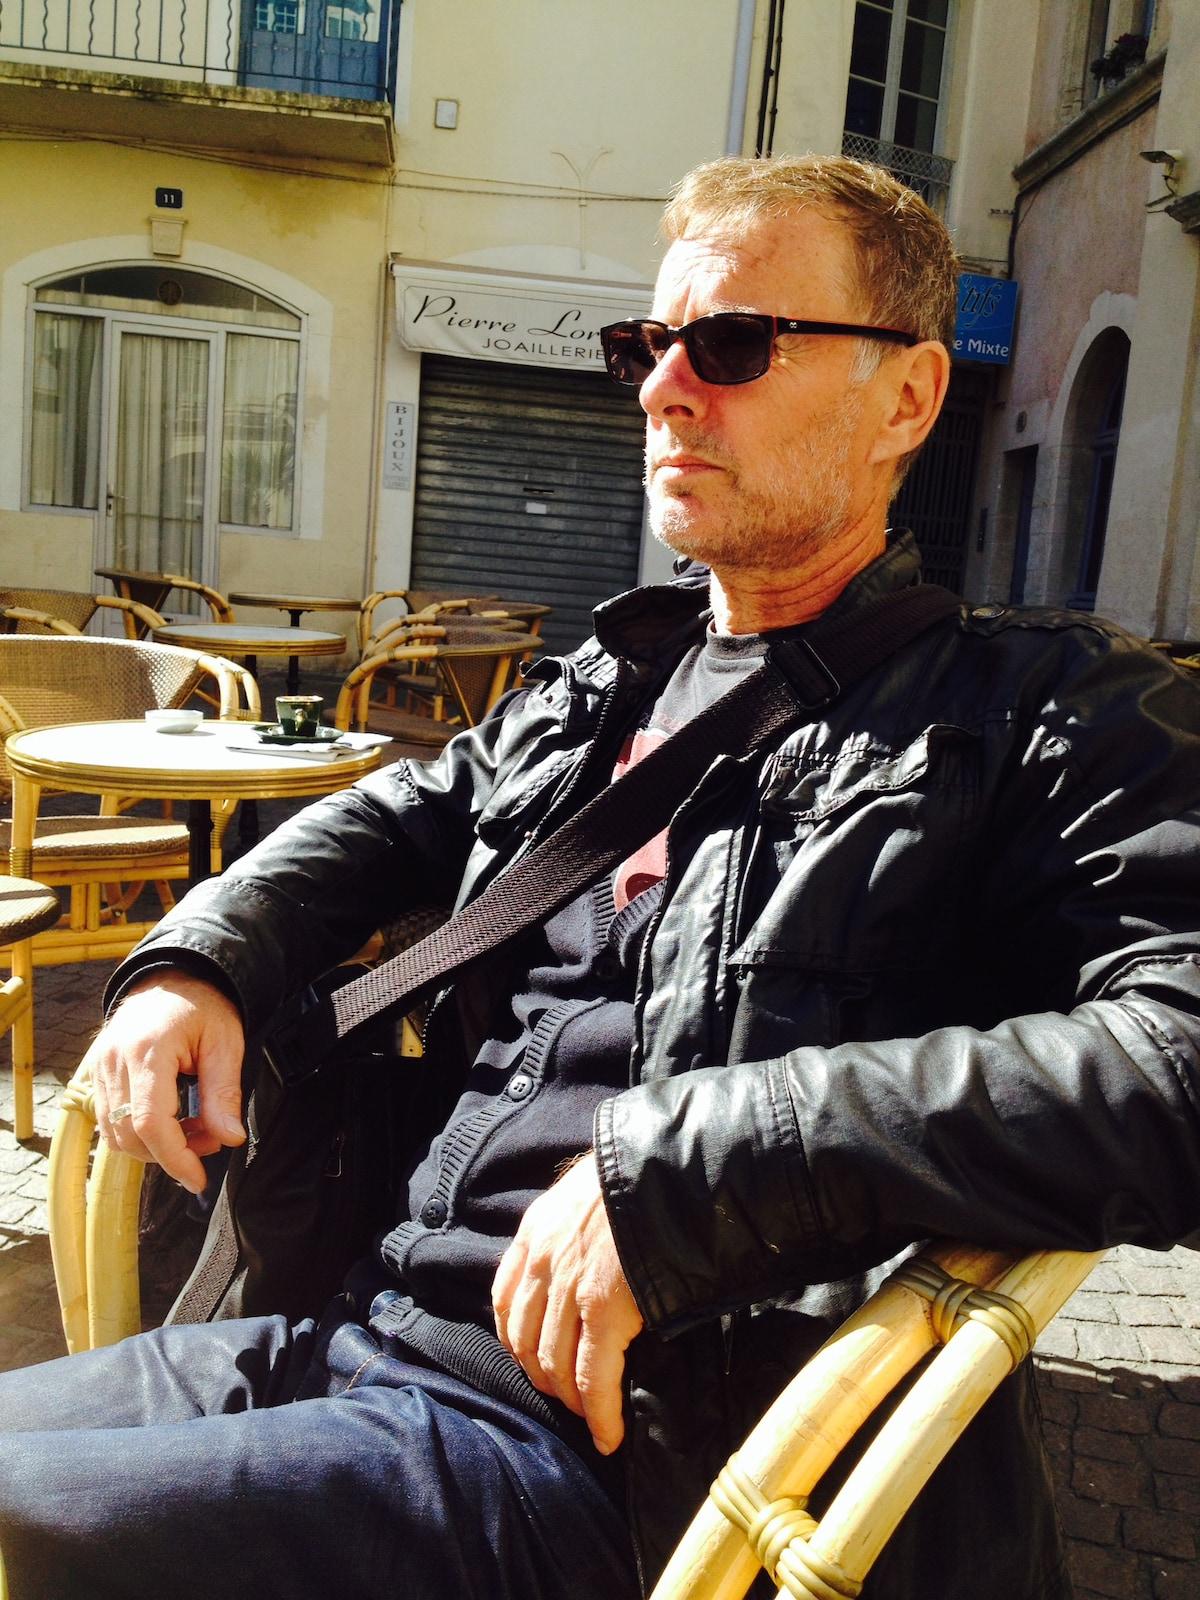 Alain from Saint-Quentin-la-Poterie